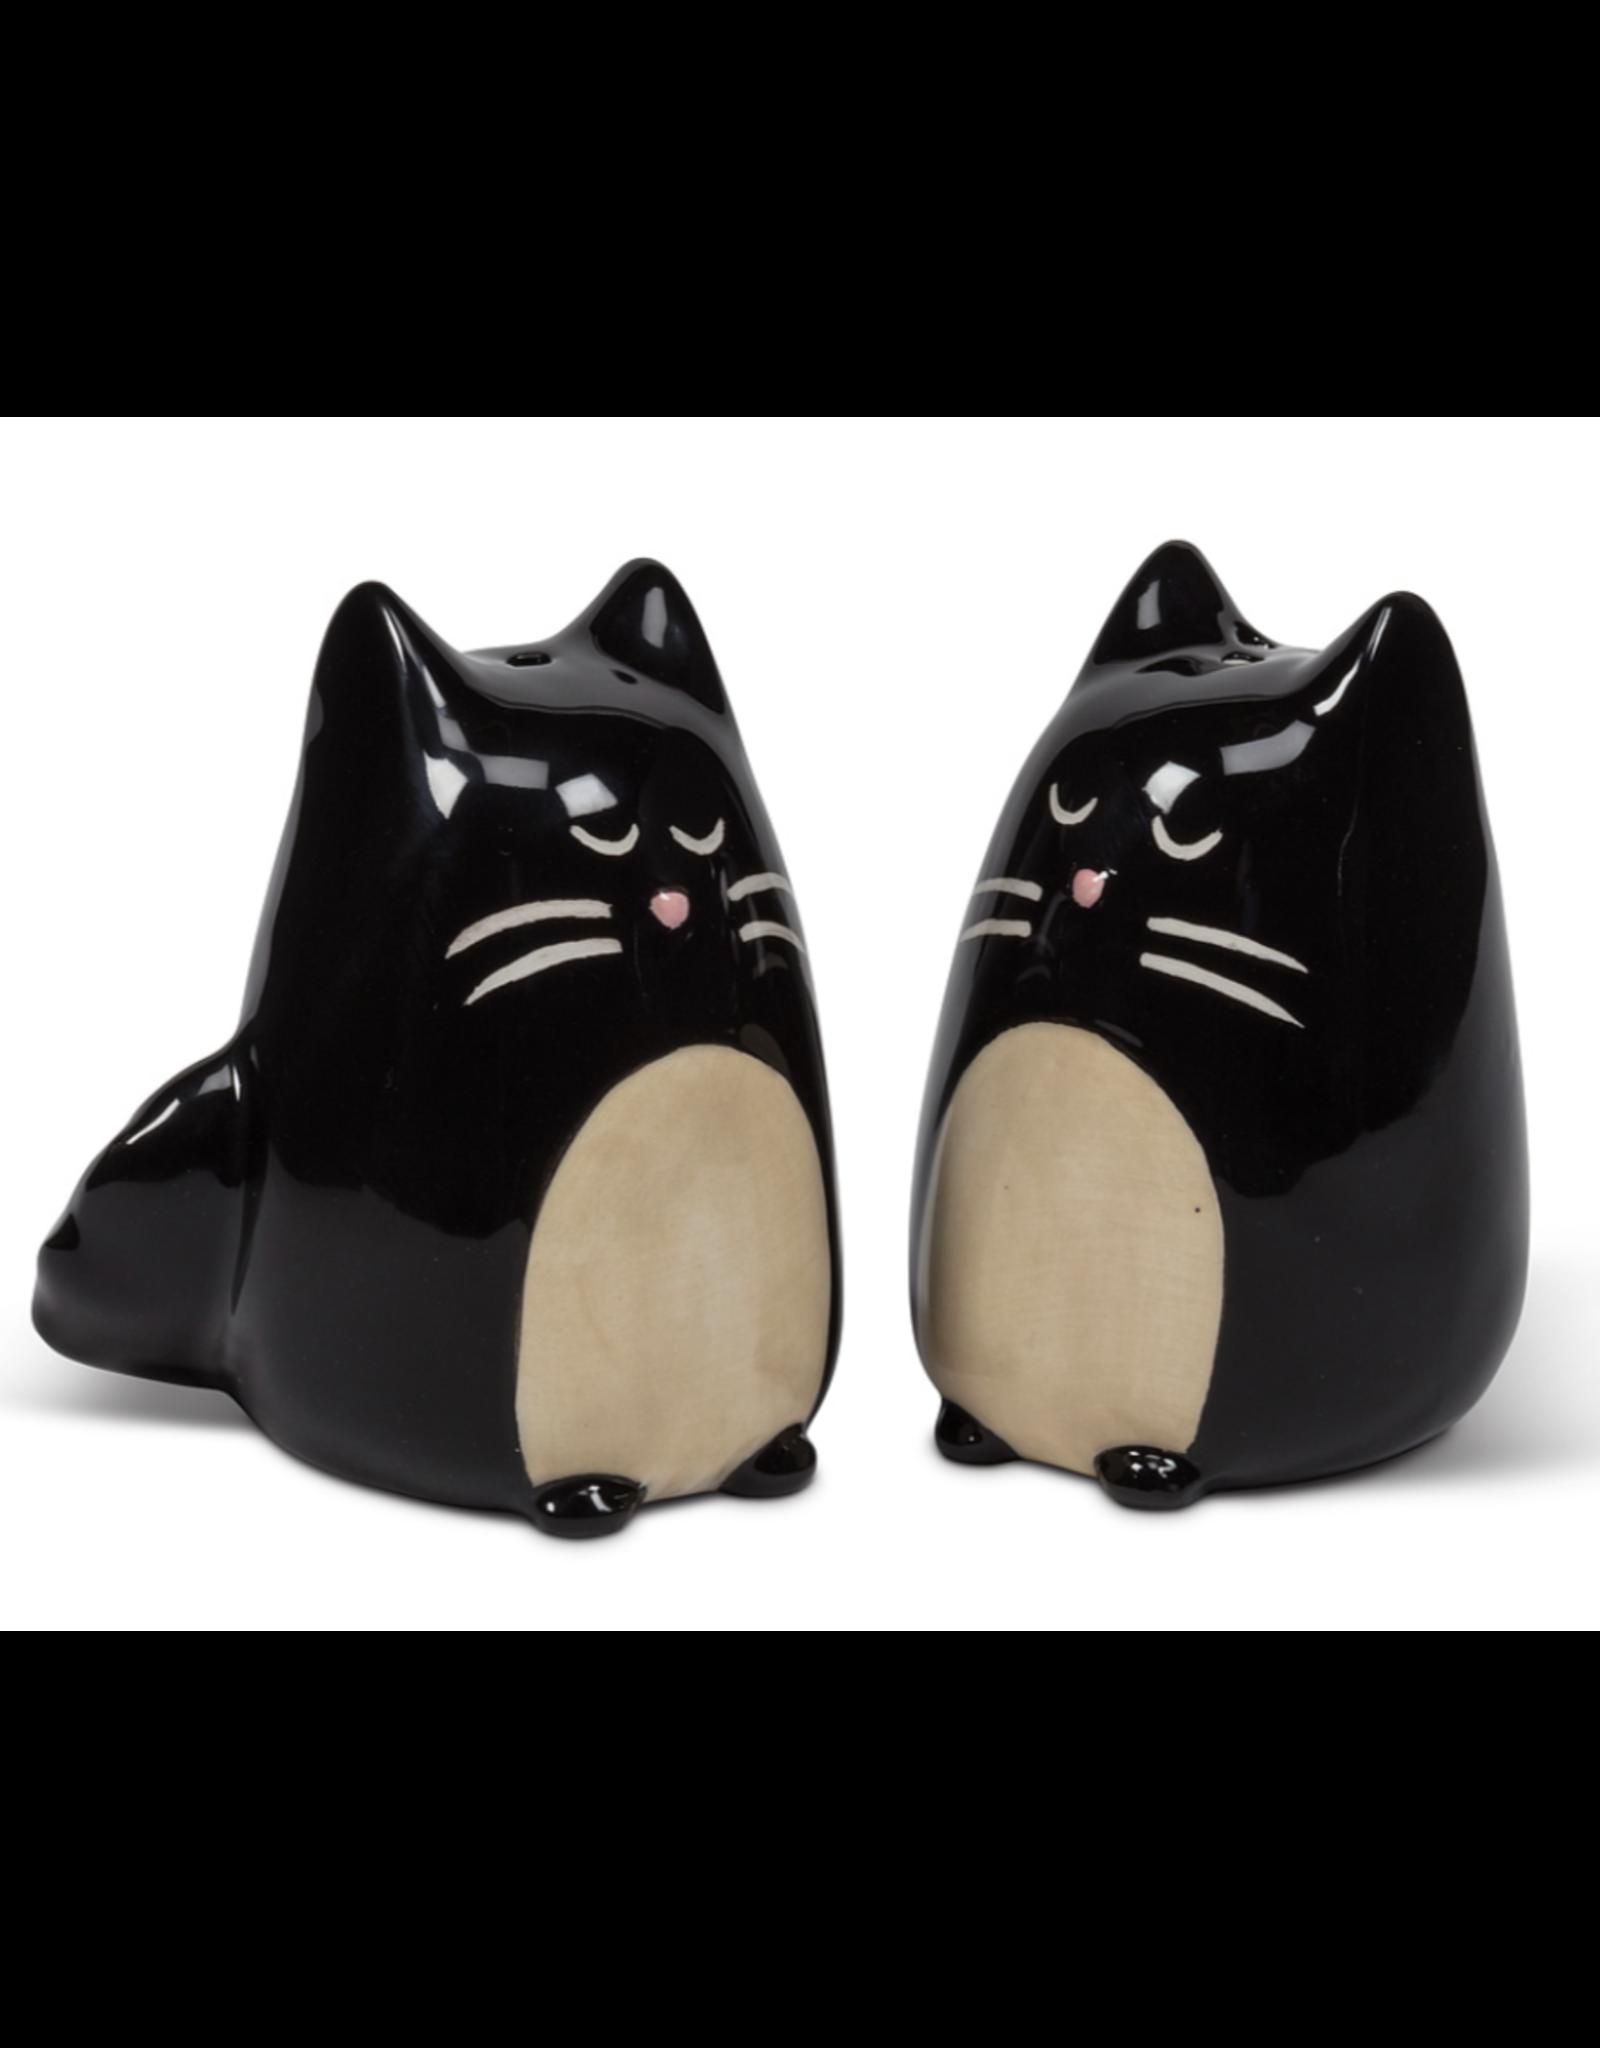 Simple Black Cat Salt & Pepper